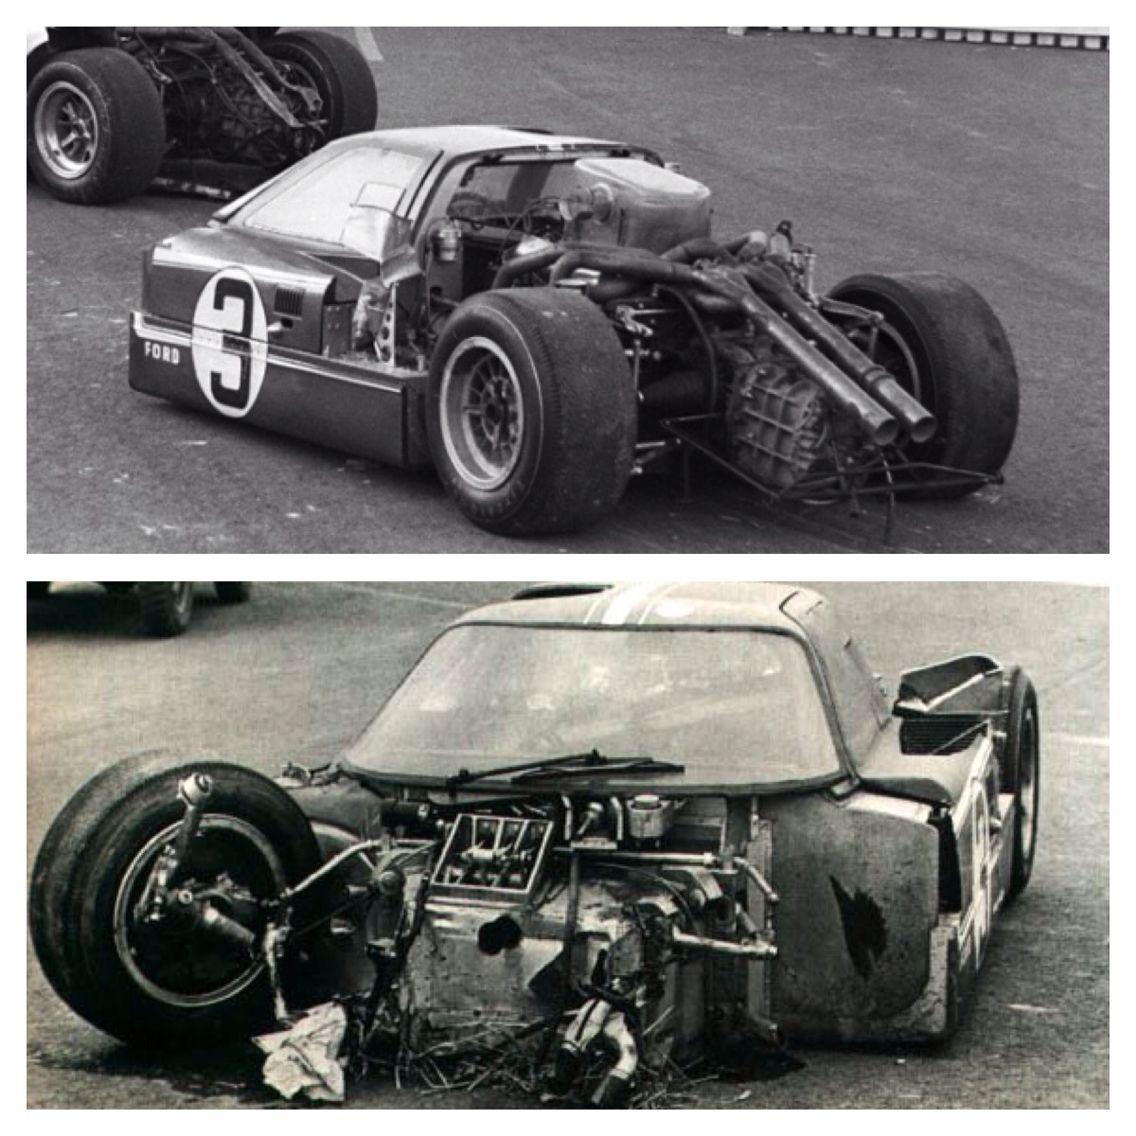 1967 Gt40 Lemans Crash Drivers Andretti Bianchi Ford Racing